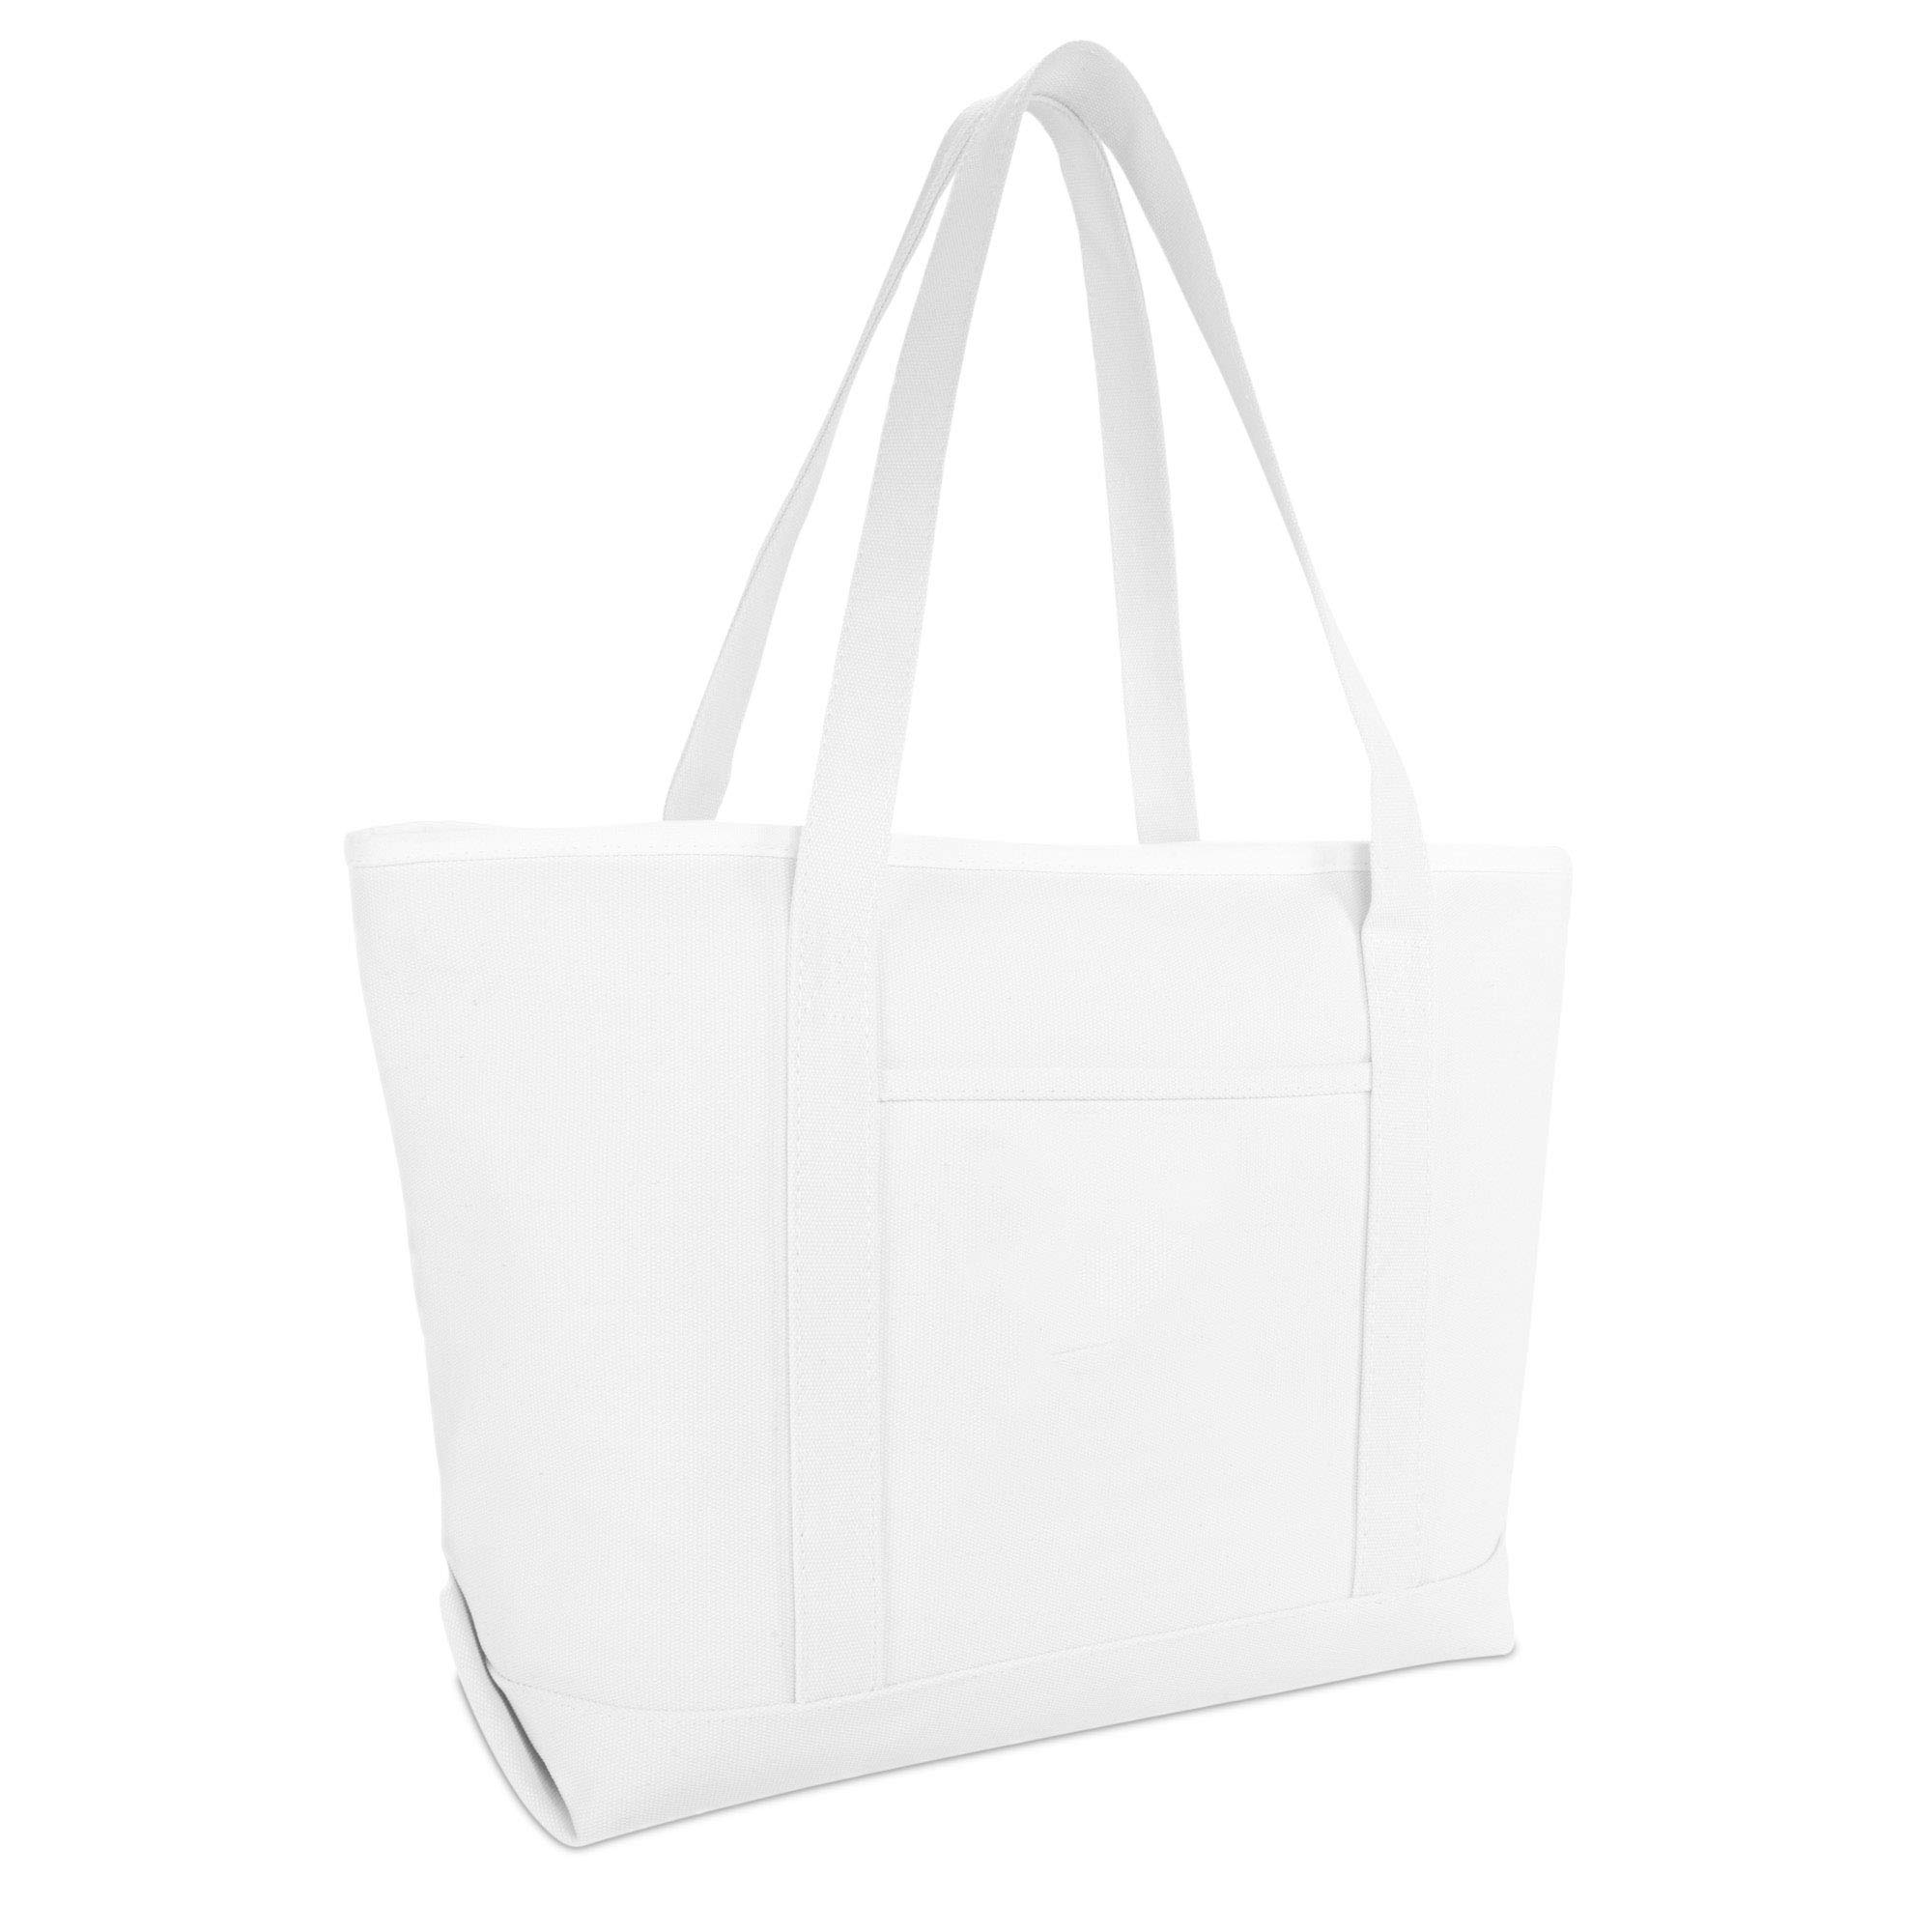 "DALIX 23"" Premium 24 oz. Cotton Canvas Shopping Tote Bag in White"